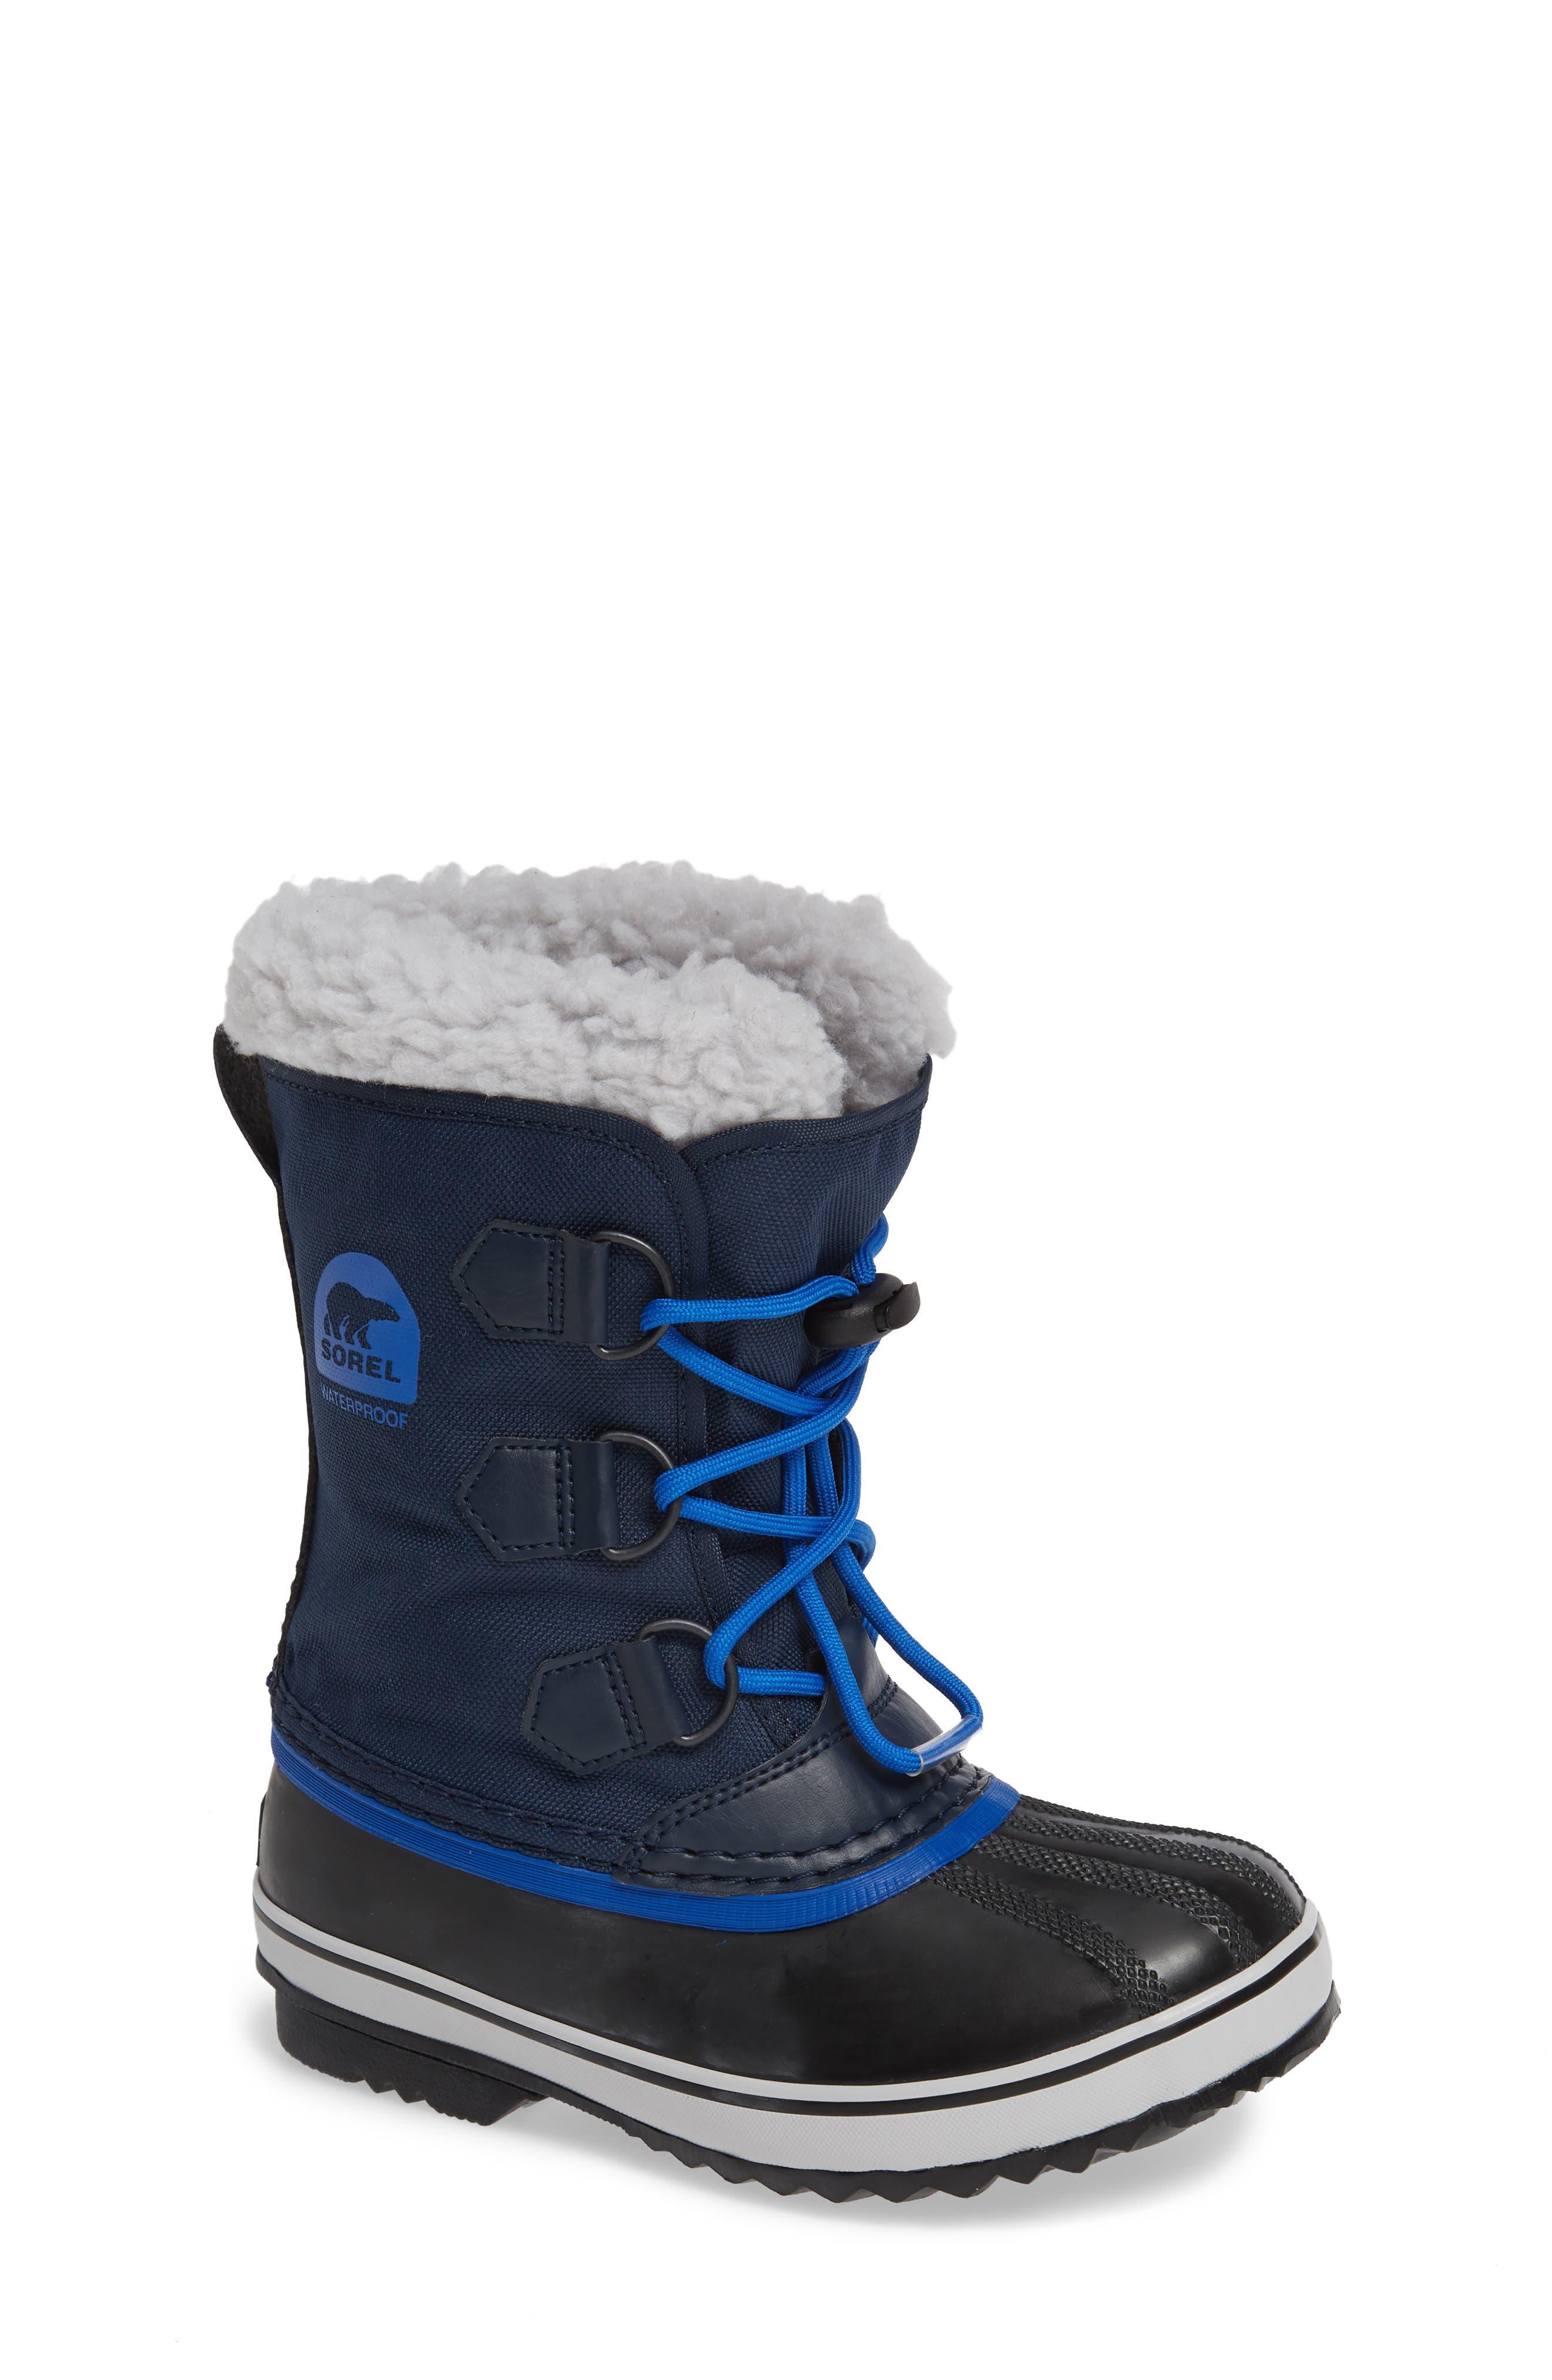 Estee lauder christmas gift set 2019 boots on sale